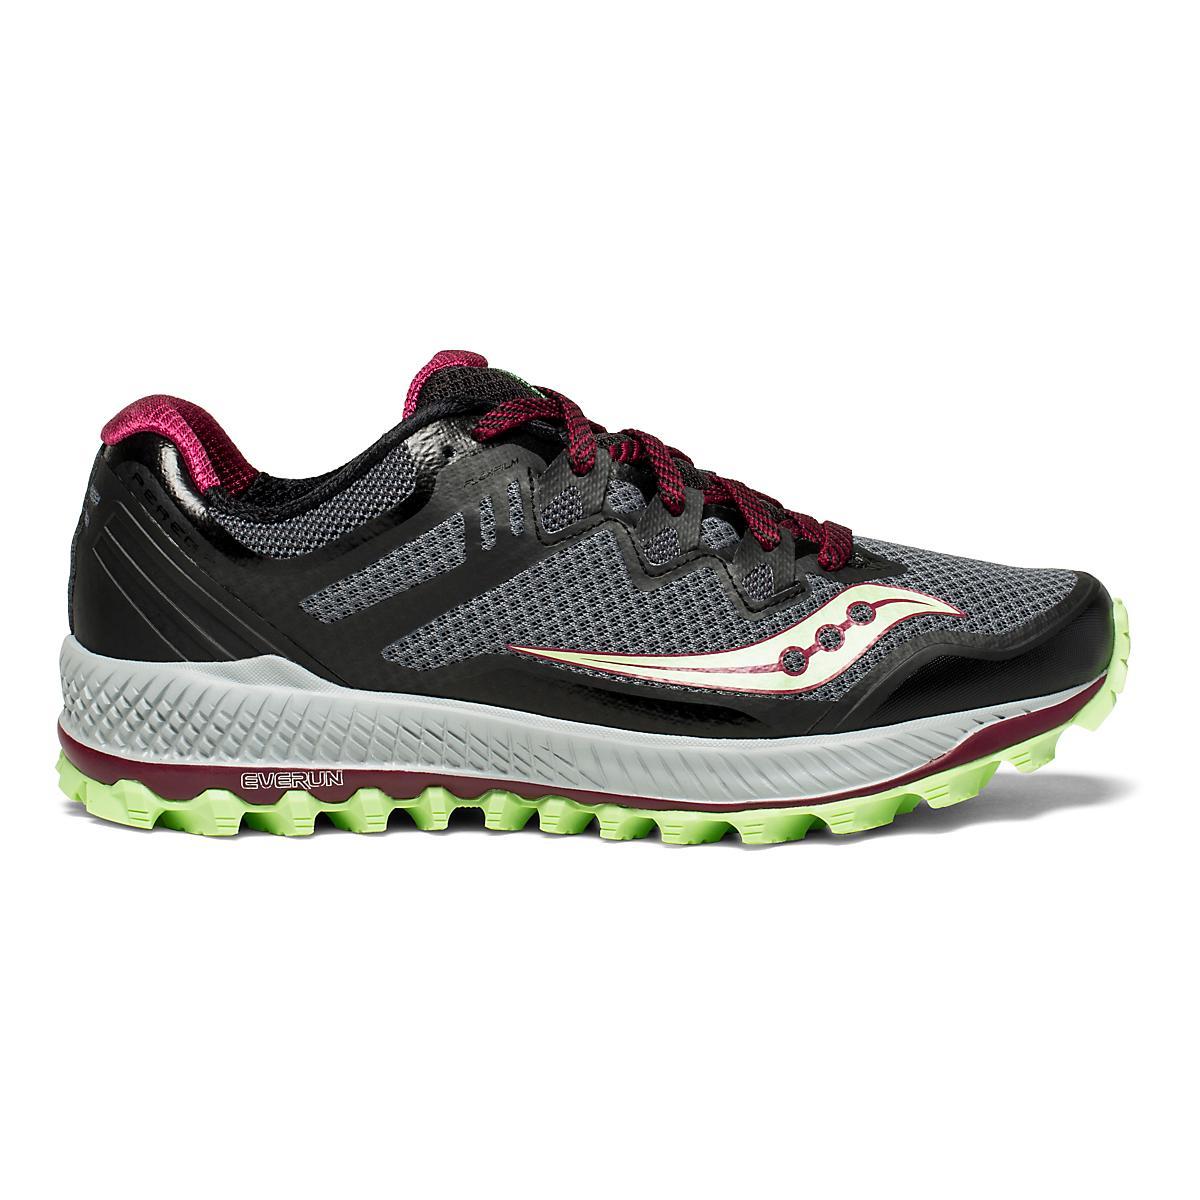 661afa9ebd68 Womens Saucony Peregrine 8 Trail Running Shoe at Road Runner Sports